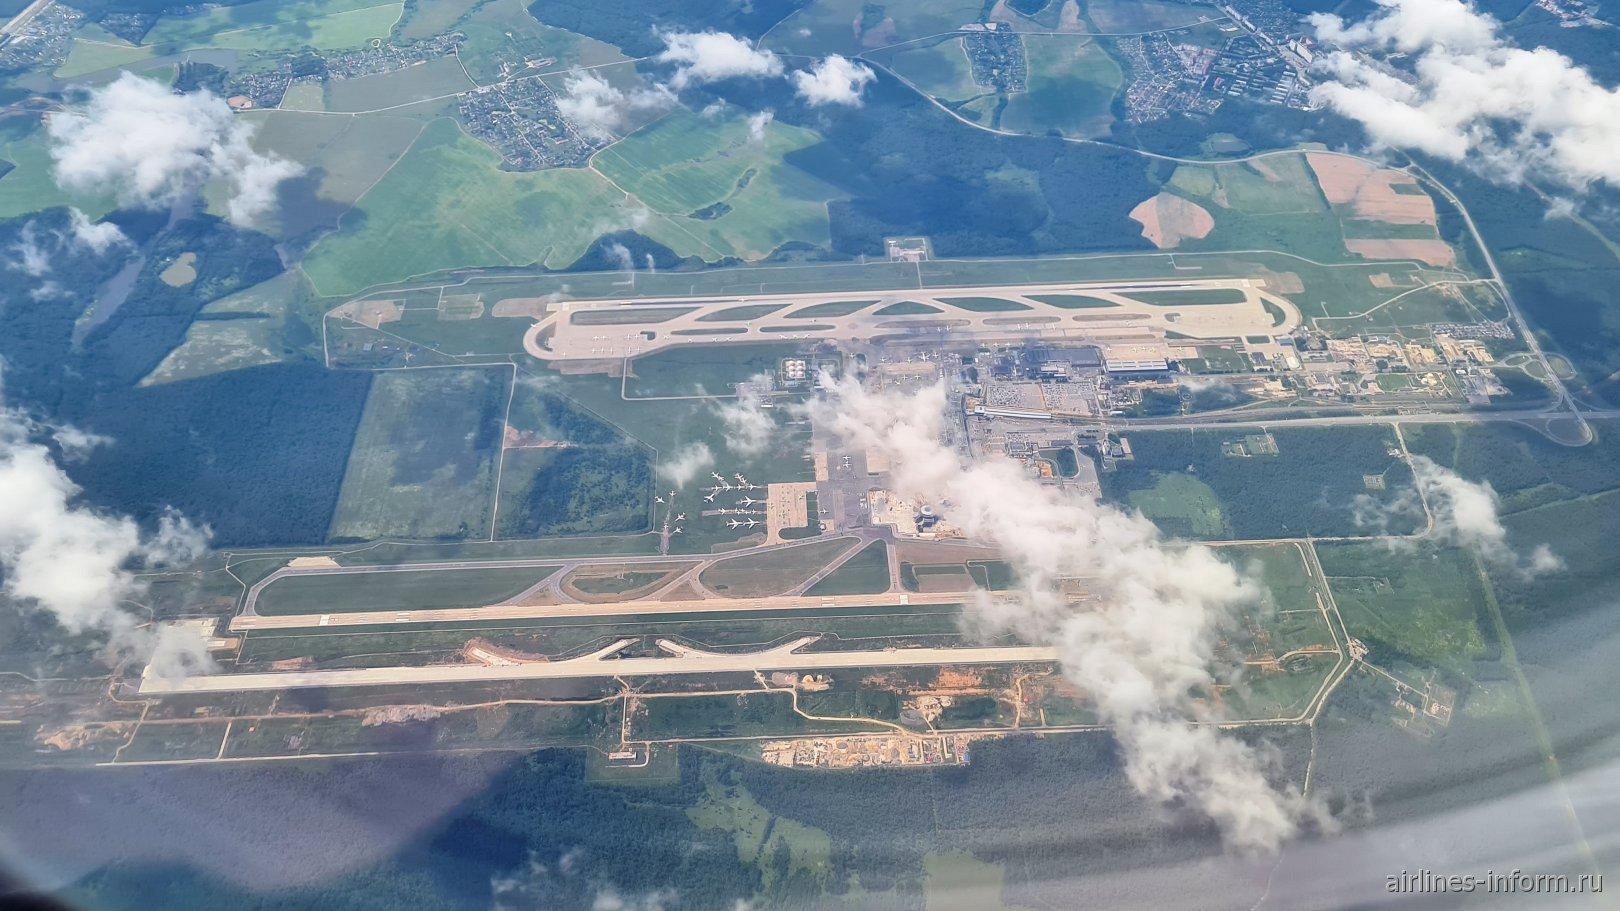 Вид сверху на аэропорт Москва Домодедово